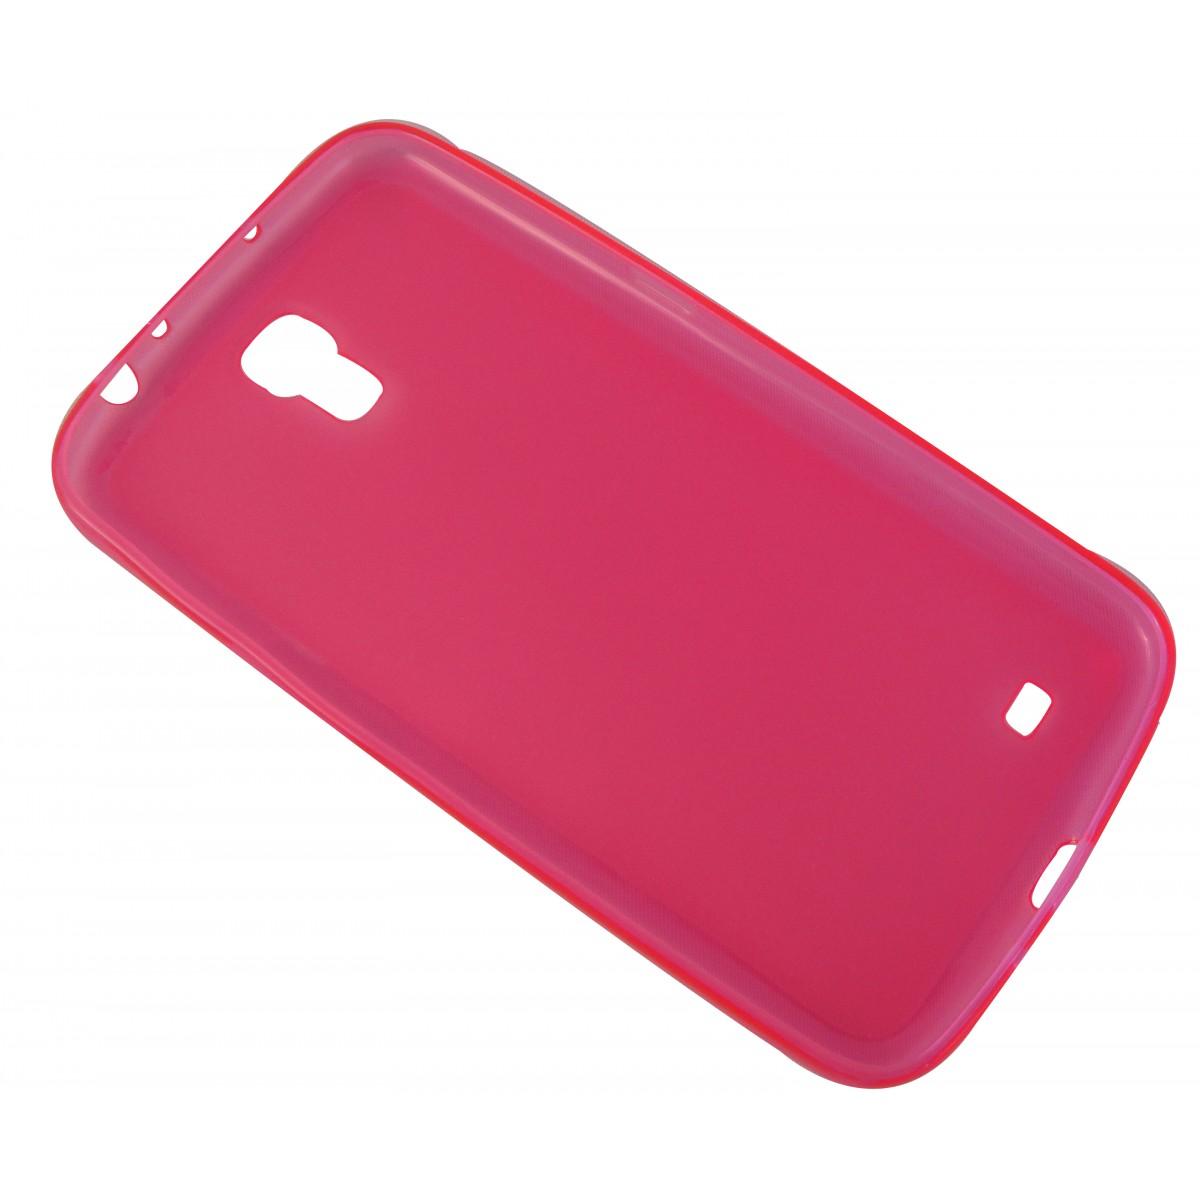 Capa TPU Rosa Samsung Galaxy Mega 6.3 I9200 + Película Flexível